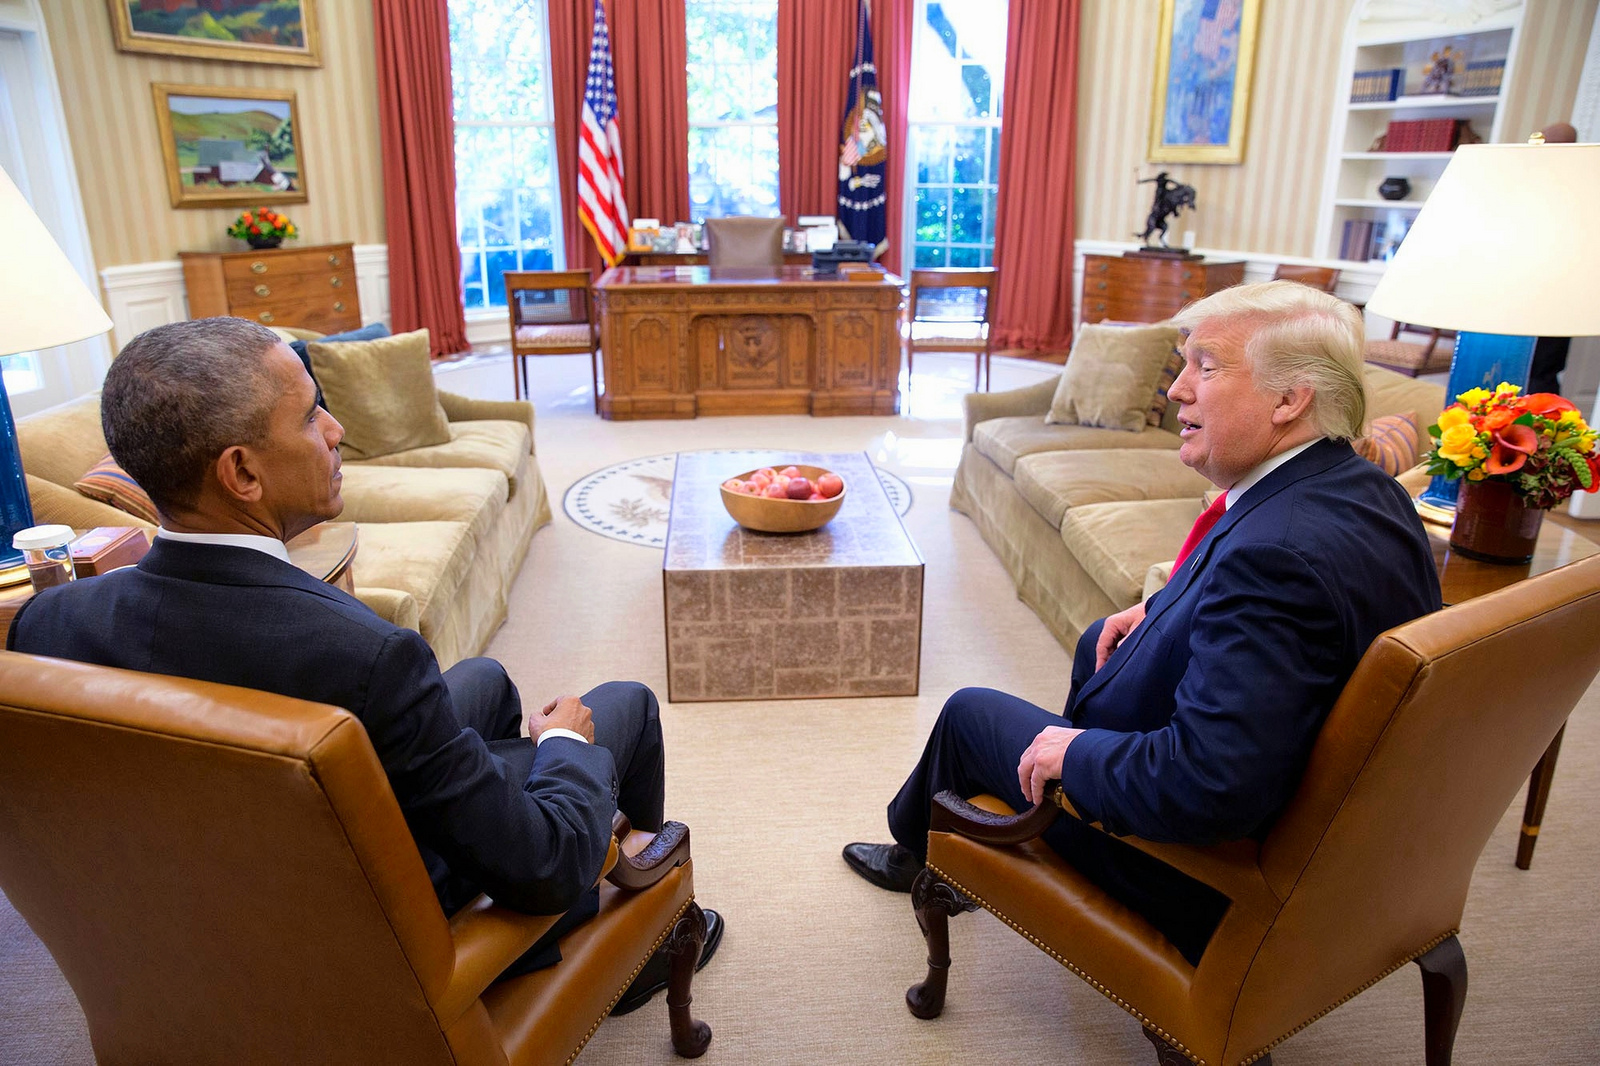 Obama Admin Declared War On Trump Trump Declared War Back